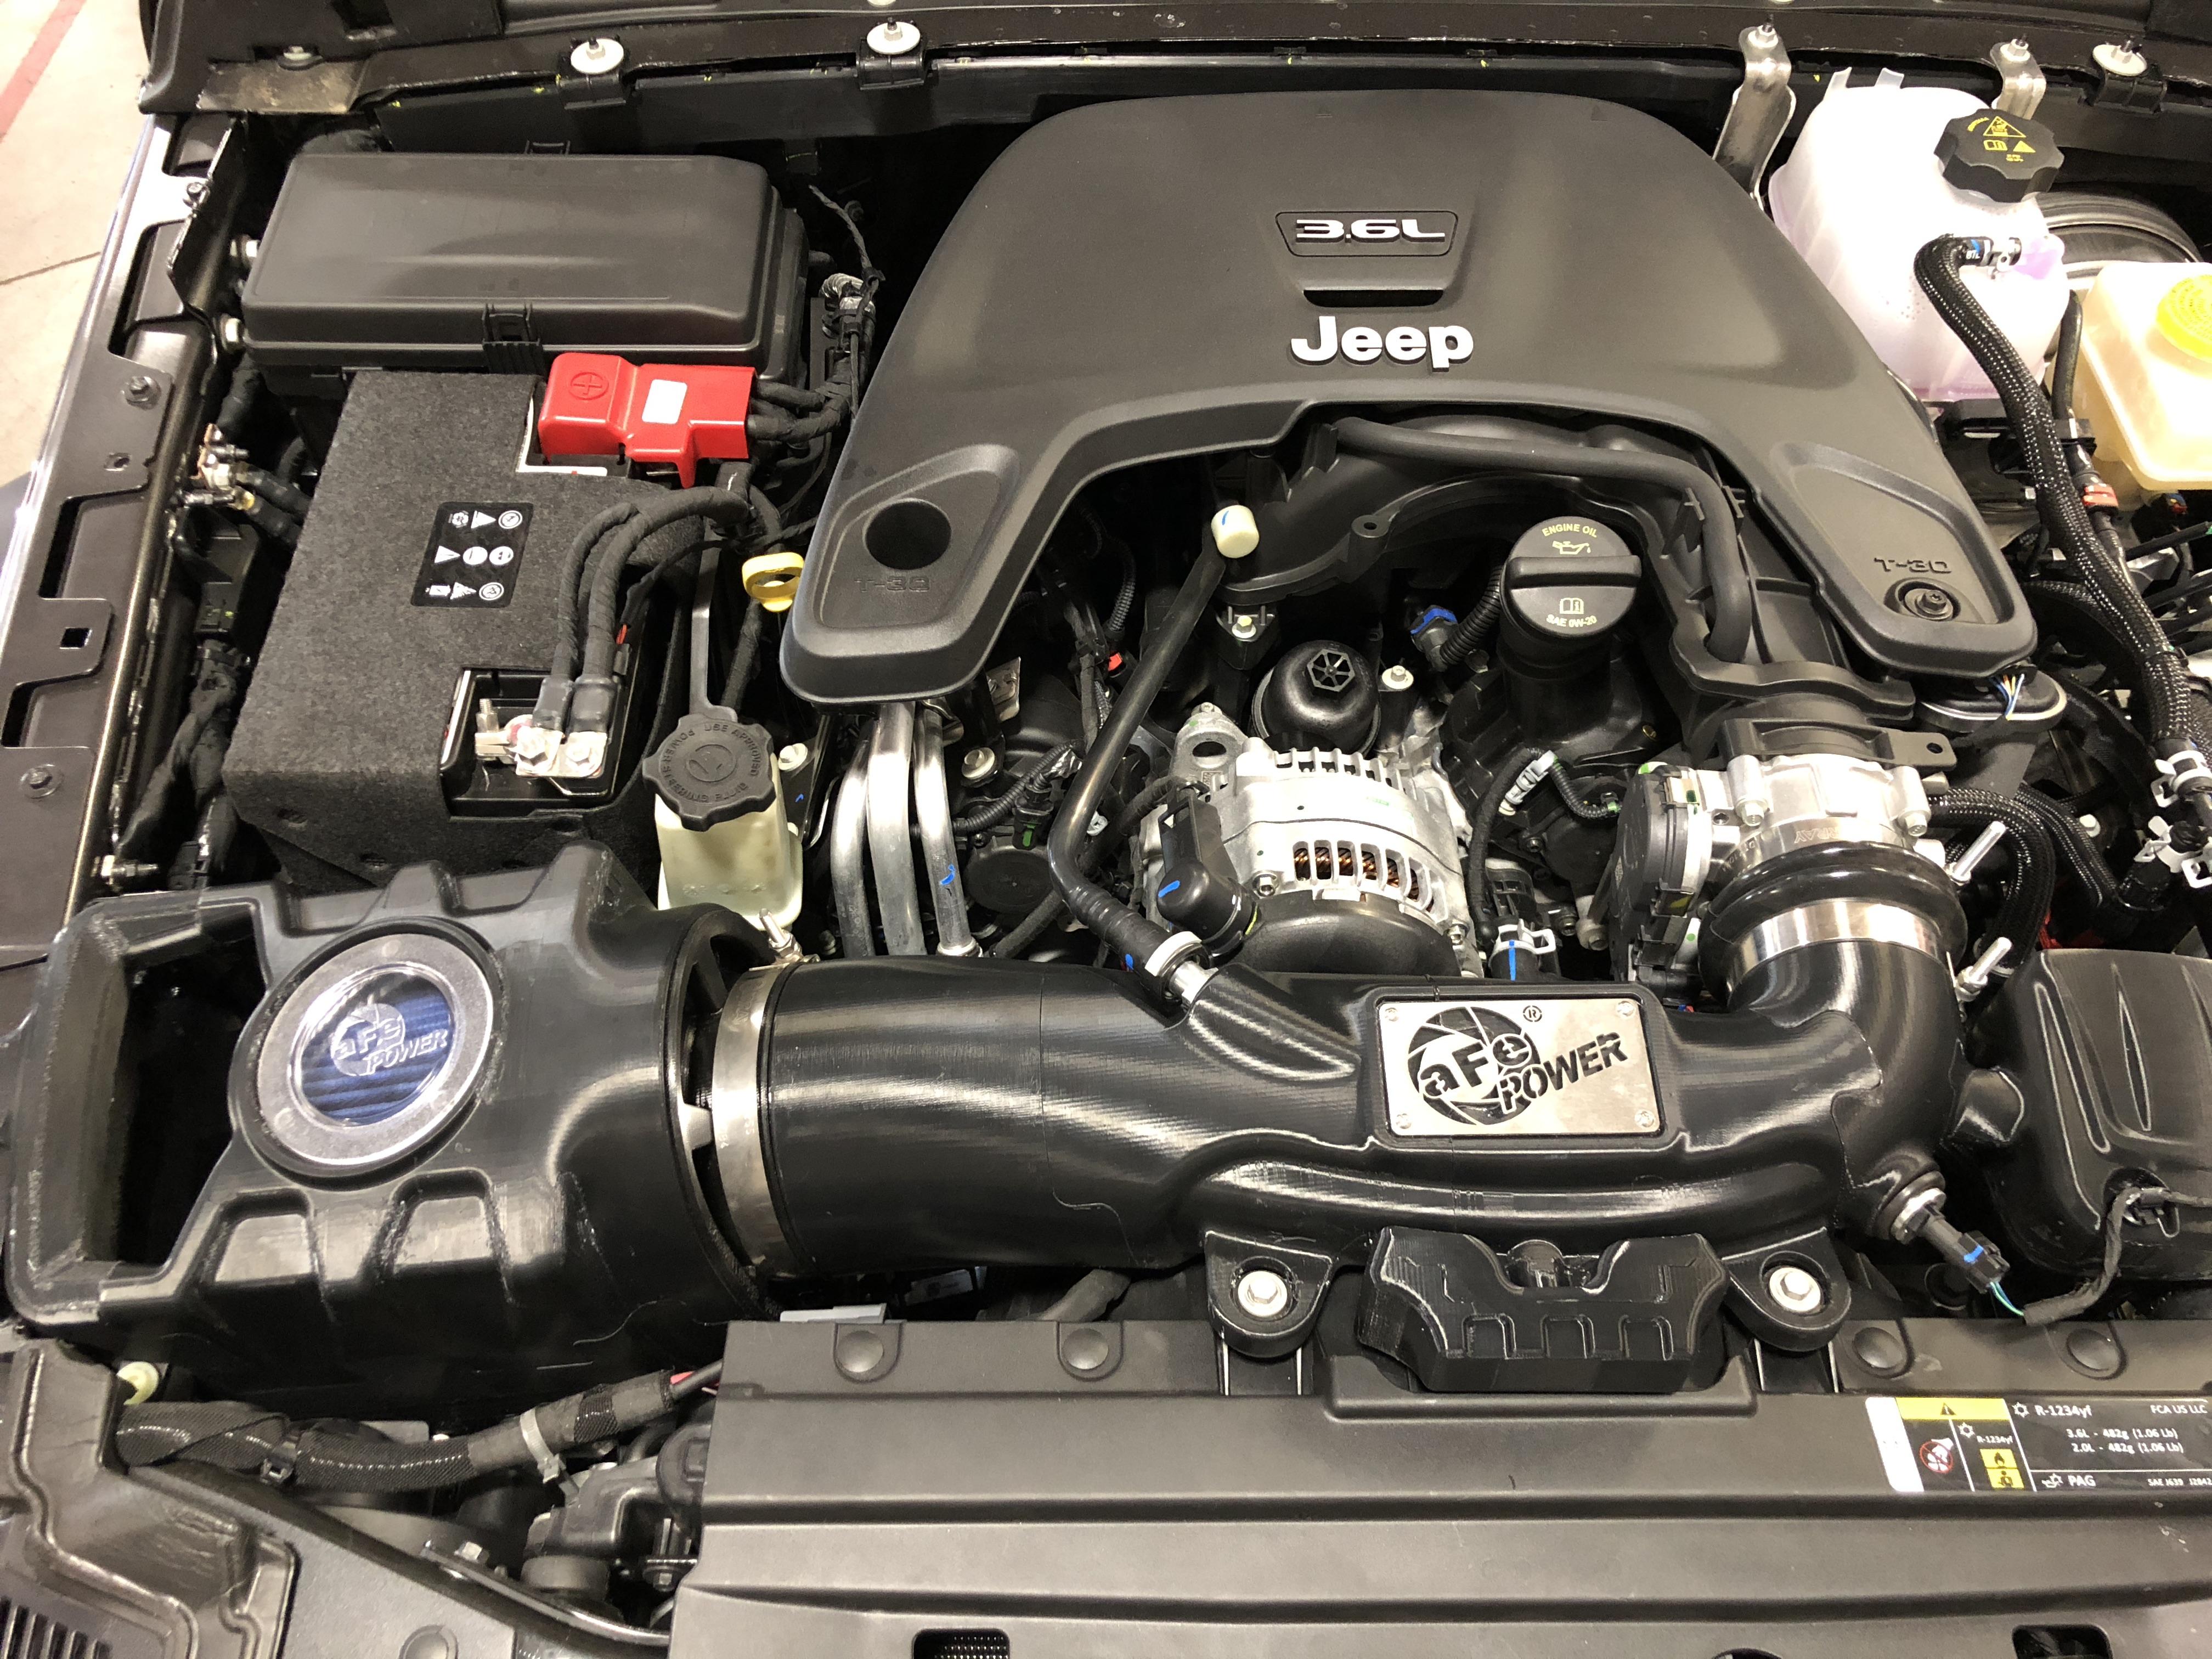 Jeep JL V6 Intake